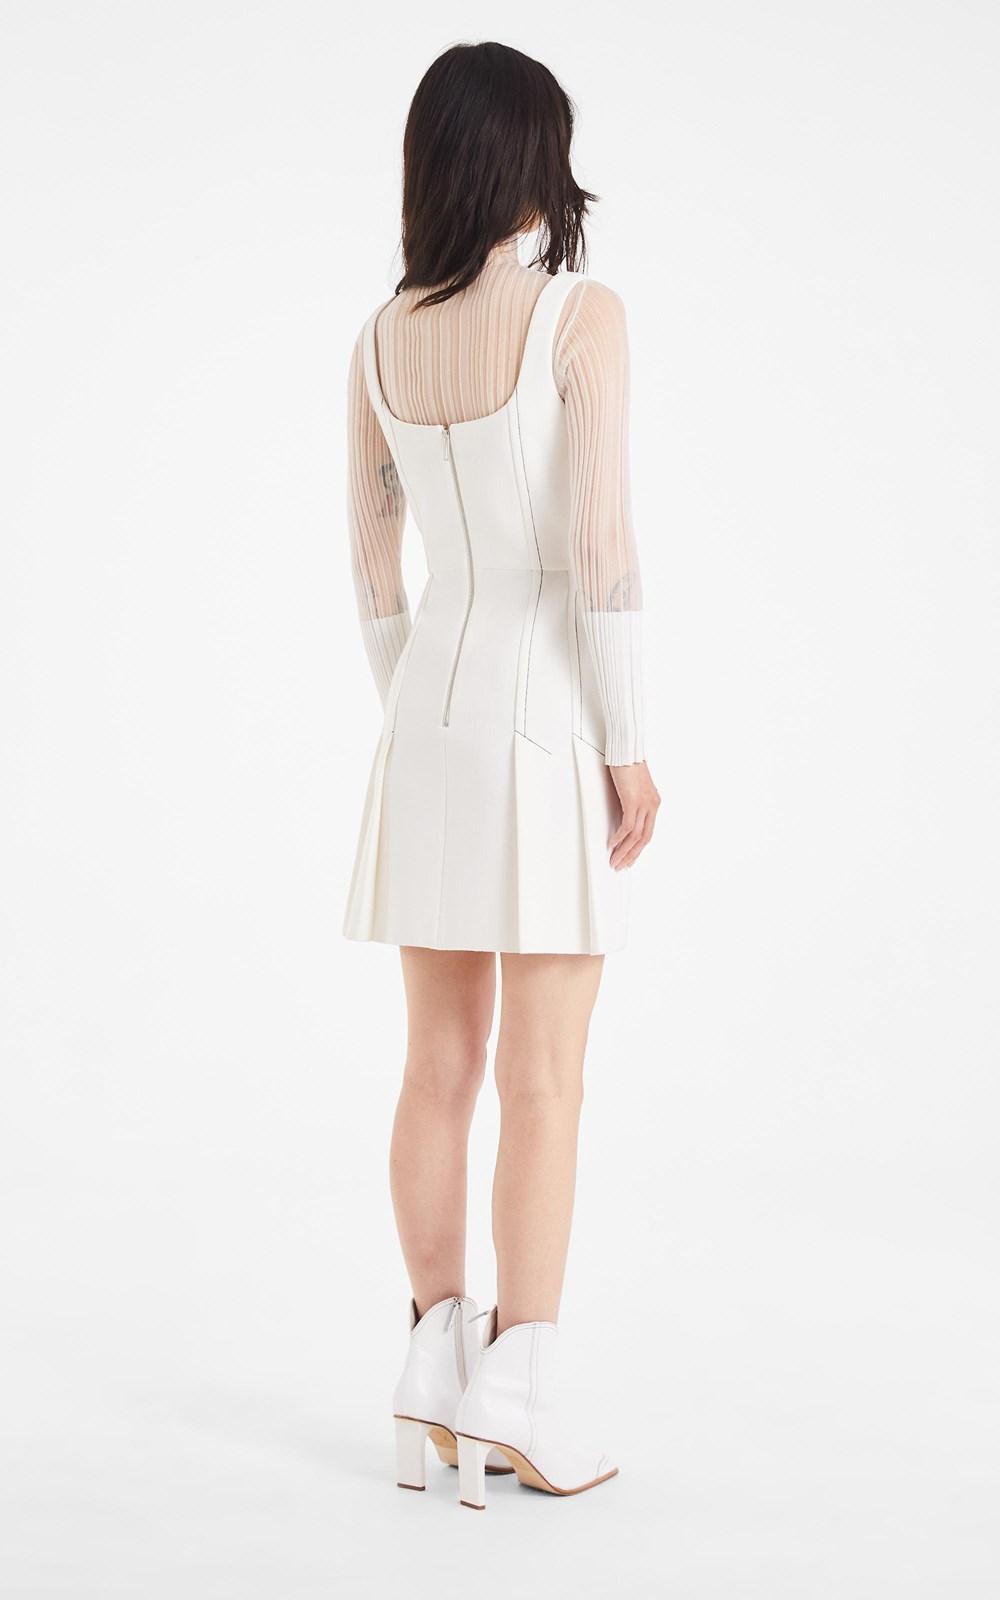 Dresses | CORSET PLEAT MINI DRESS